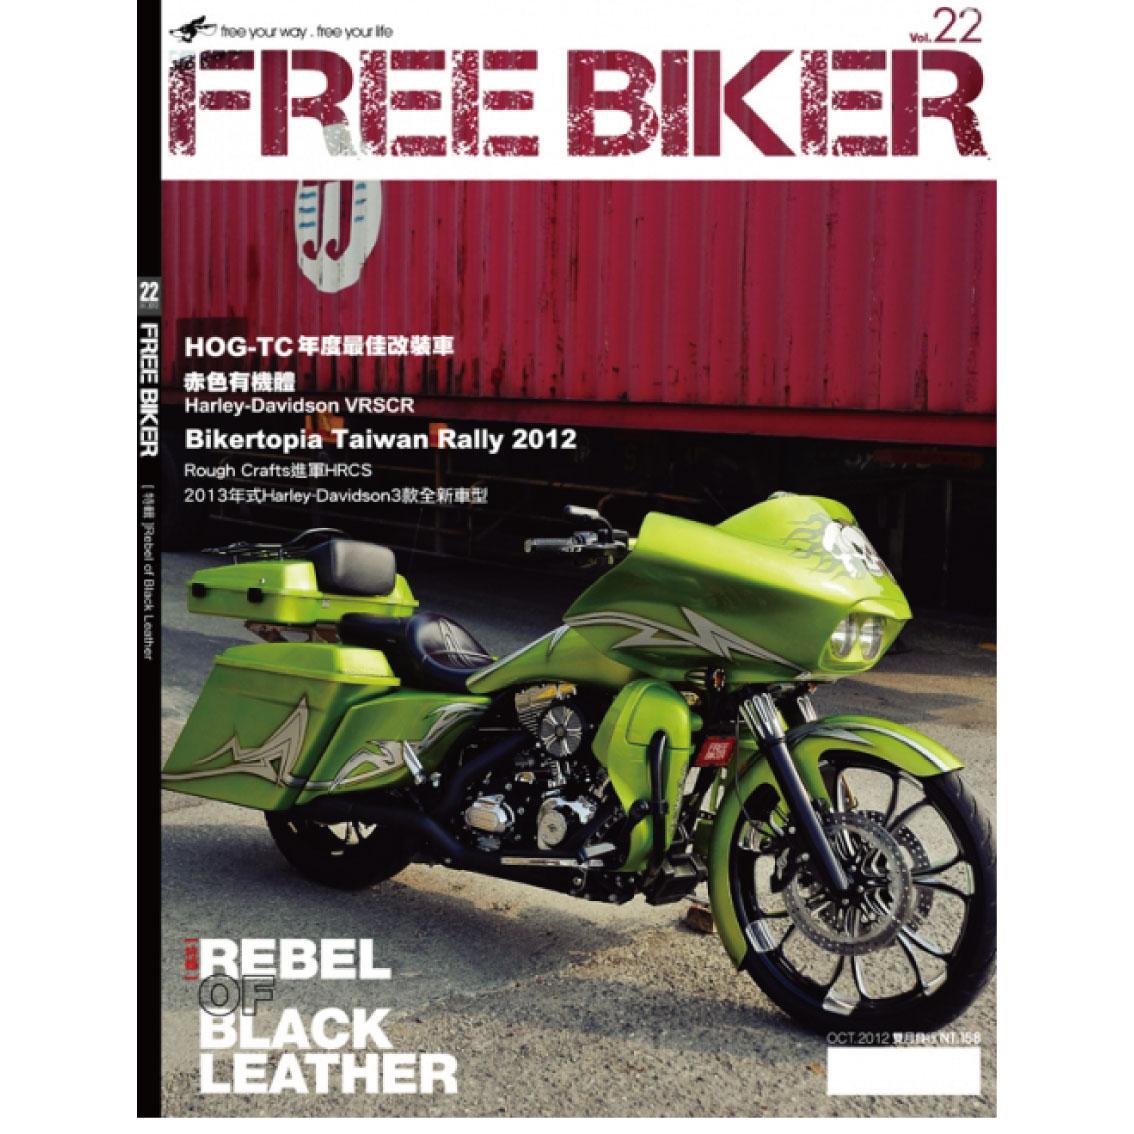 超低價!! FREE BIKER - VOL.22